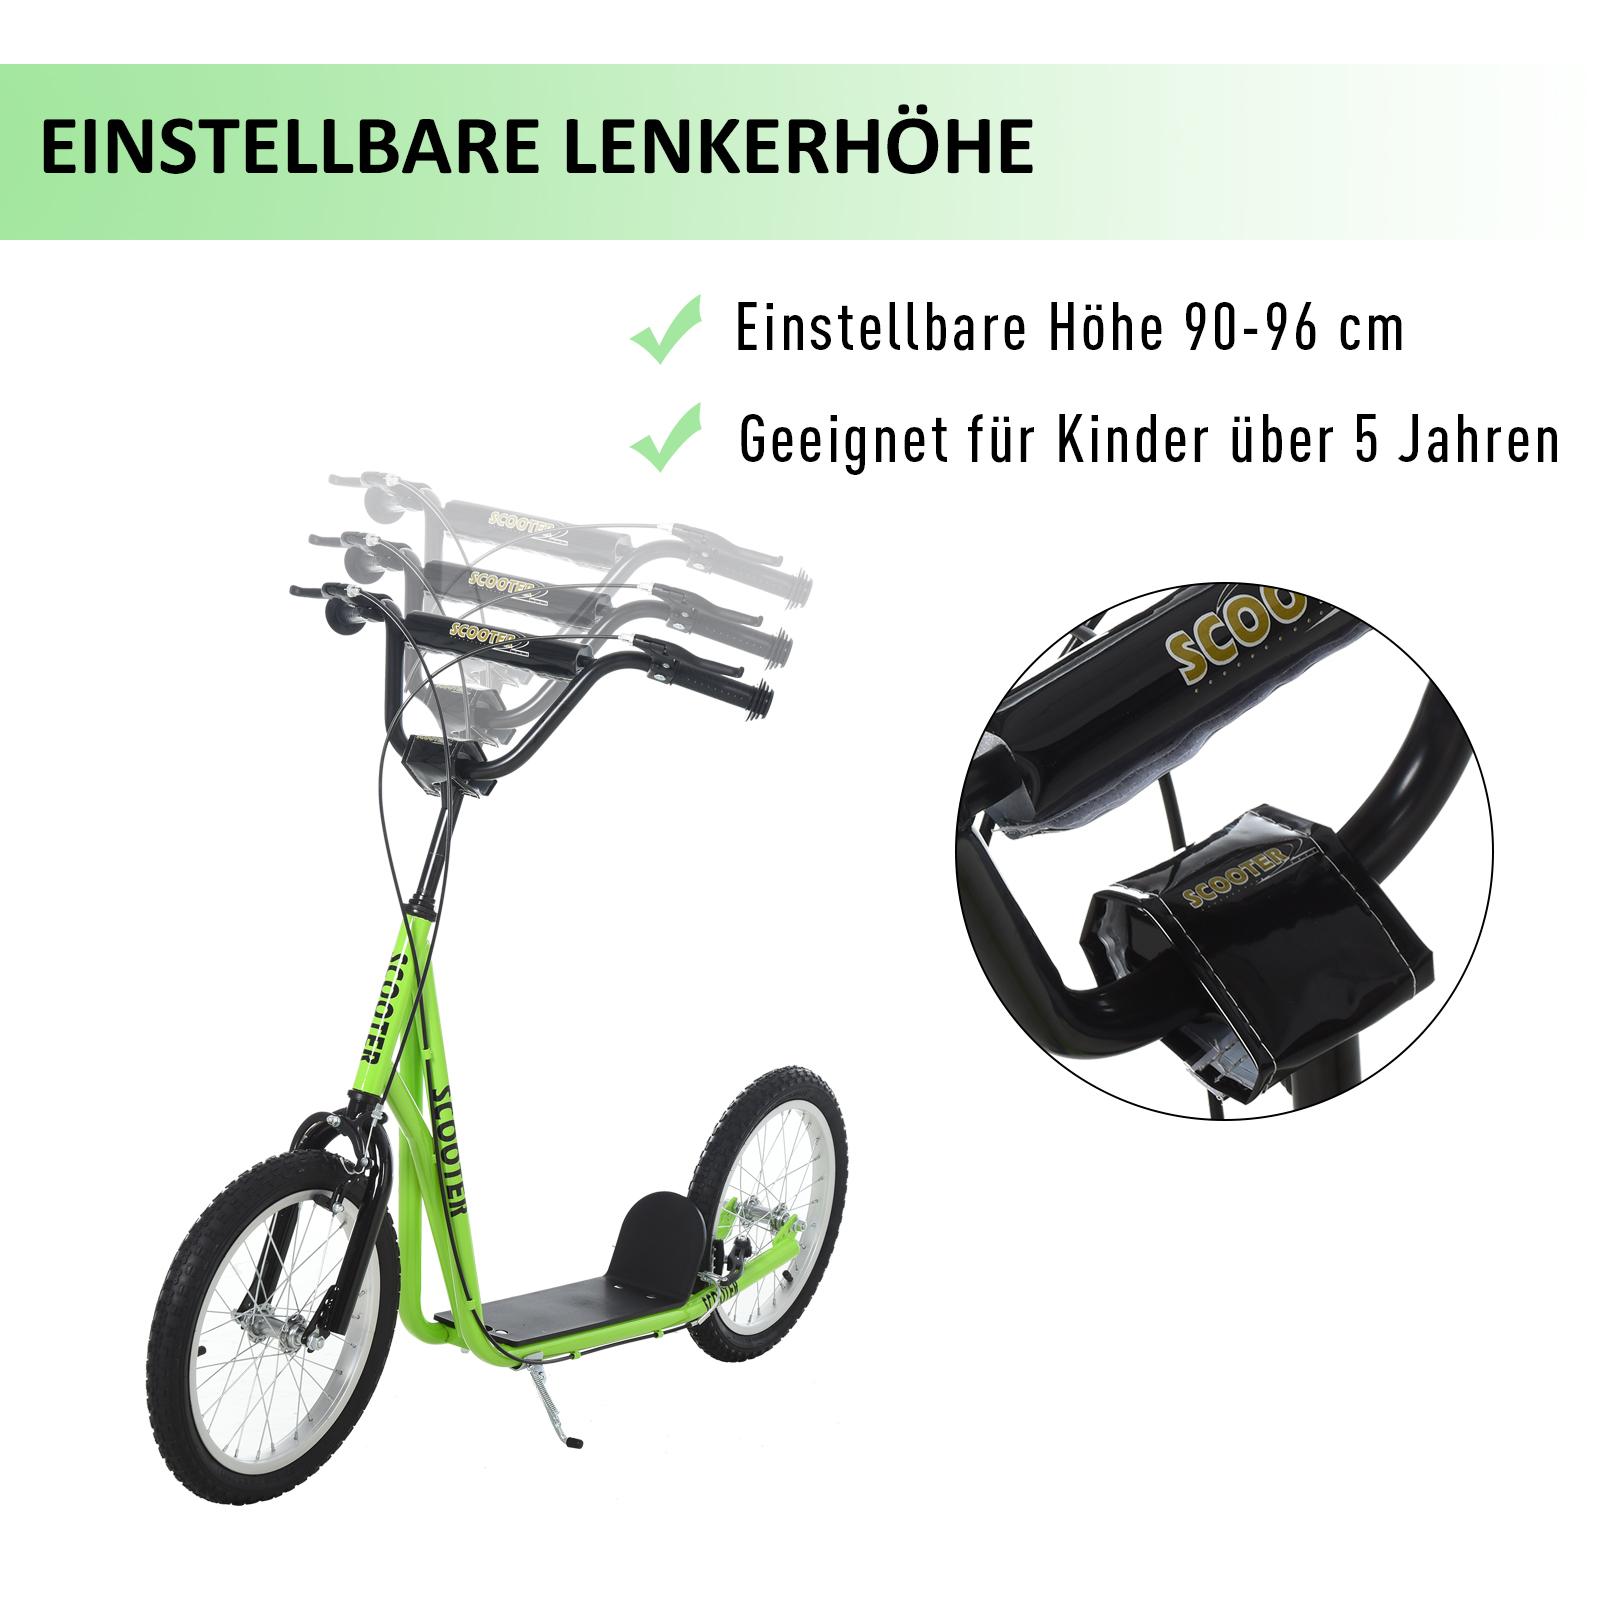 Indexbild 22 - HOMCOM-Tretroller-Kinderroller-Scooter-Cityroller-Roller-verstellbar-Blau-Gruen